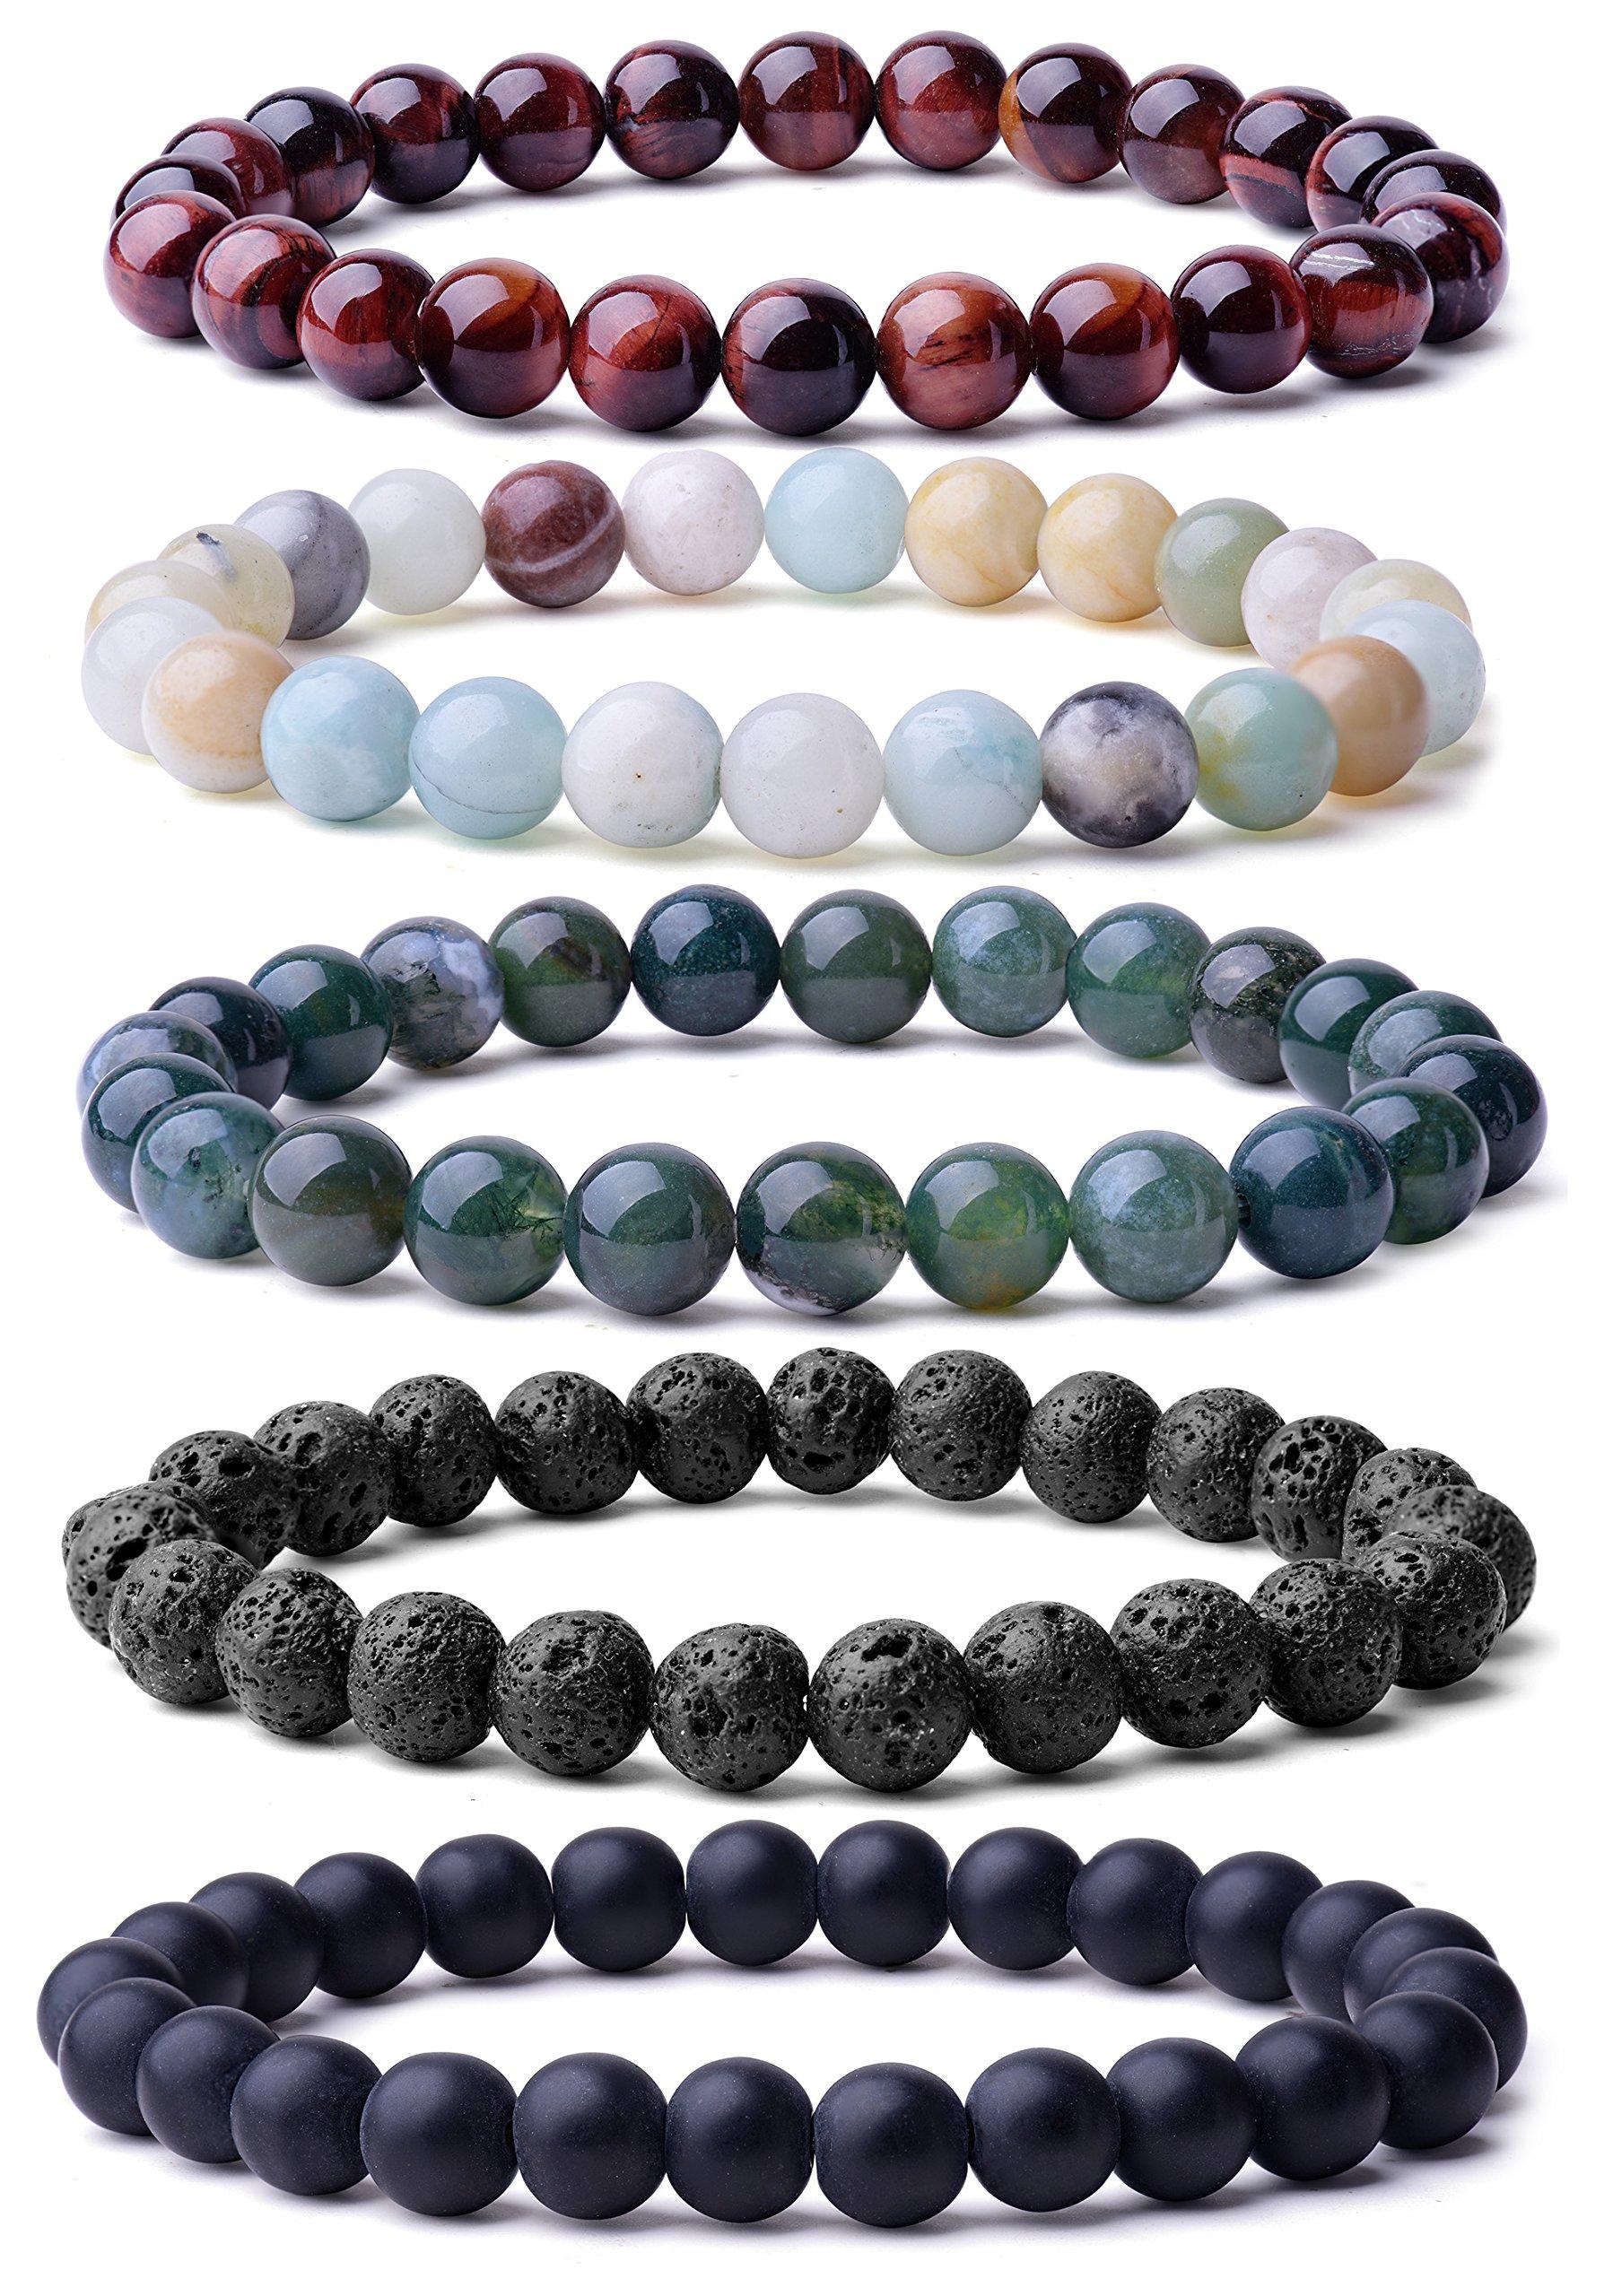 WRCXSTONE Natural 8mm Gorgeous Semi-Precious Gemstones Healing Crystal Stretch Beaded Bracelet Unisex